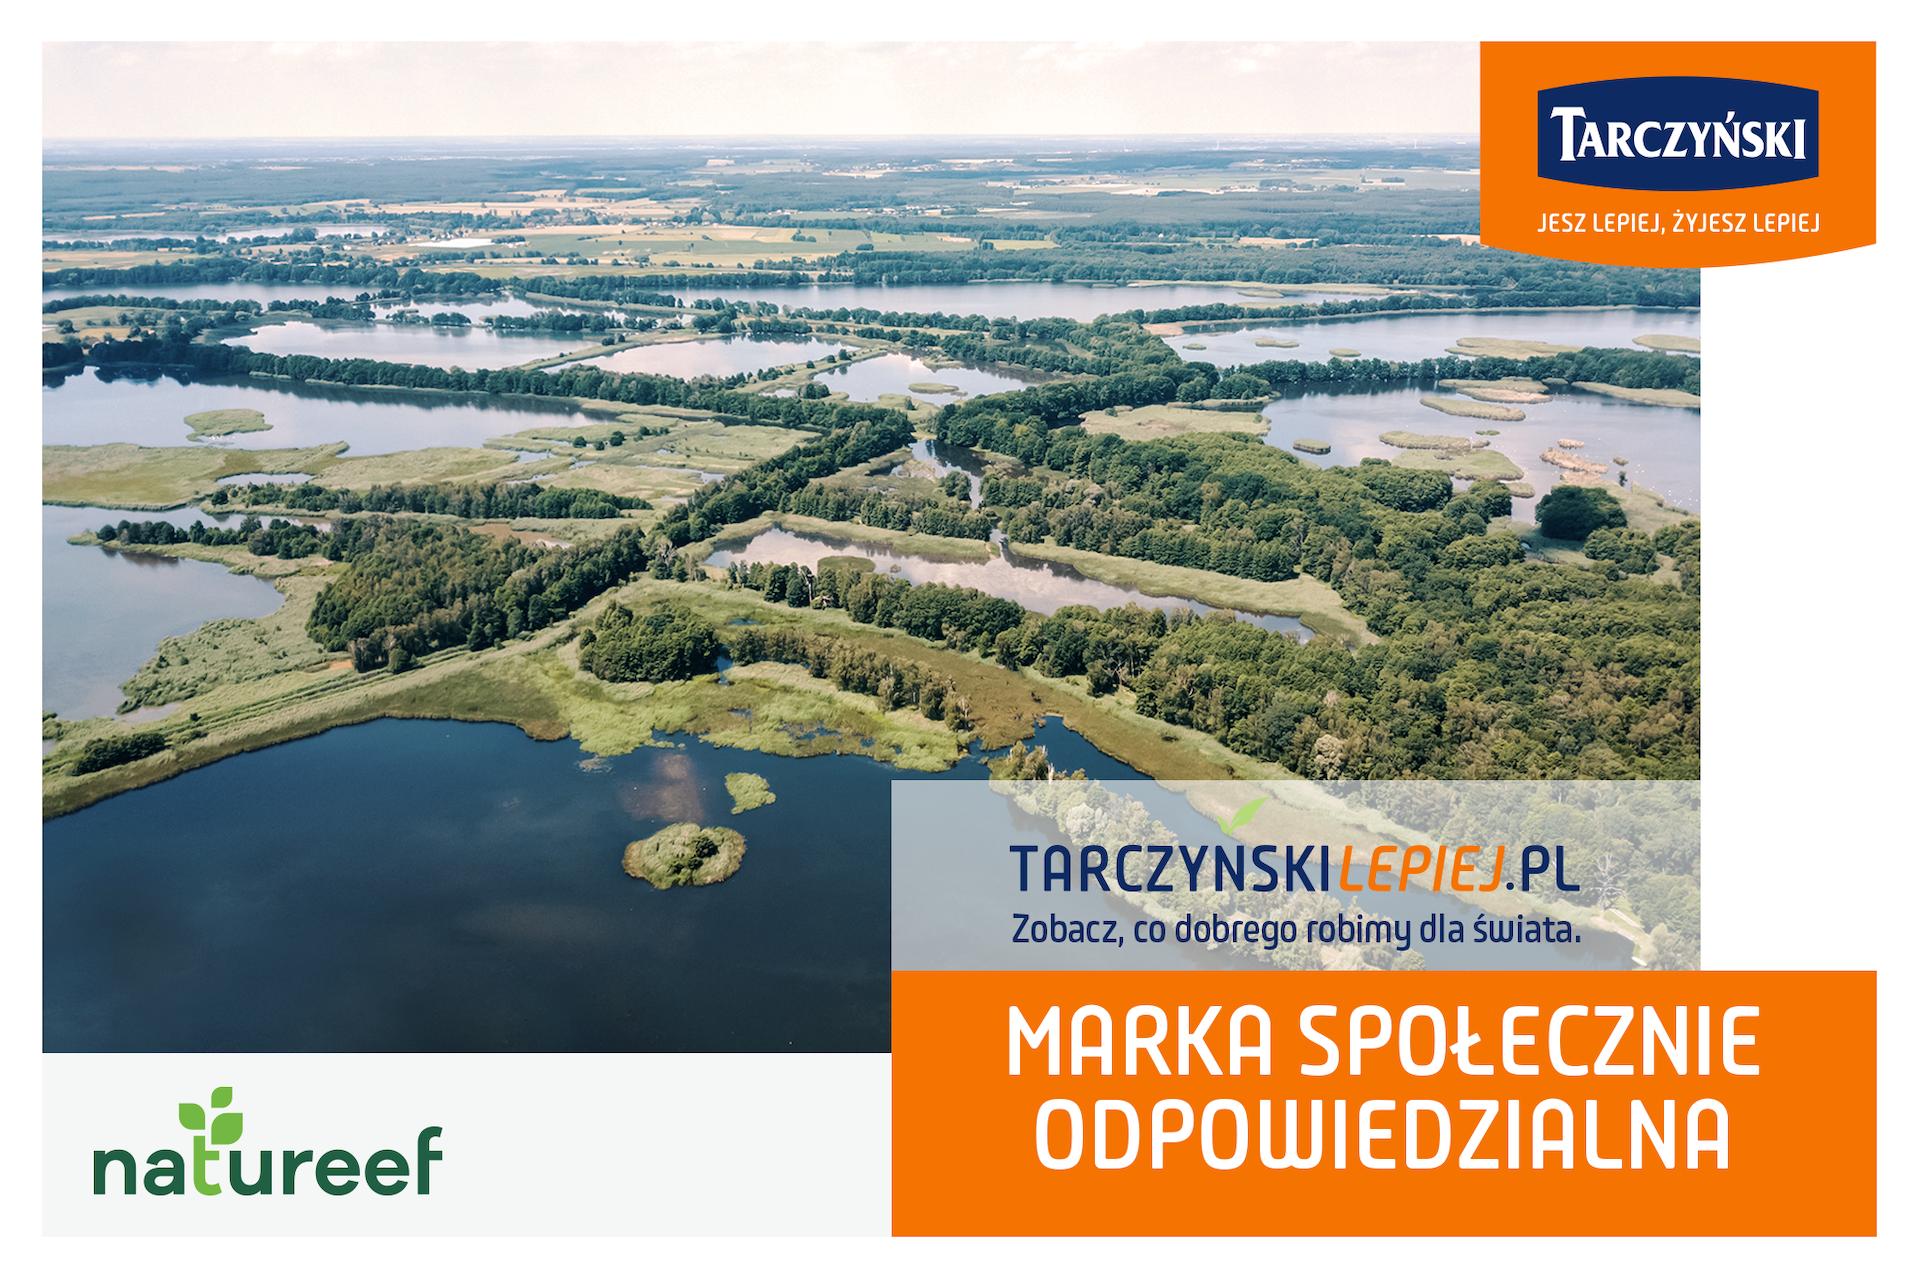 https://grupatarczynski.pl/wp-content/uploads/2021/08/AKTUALNOŚCI-ARTYKUL-NA-LI.png